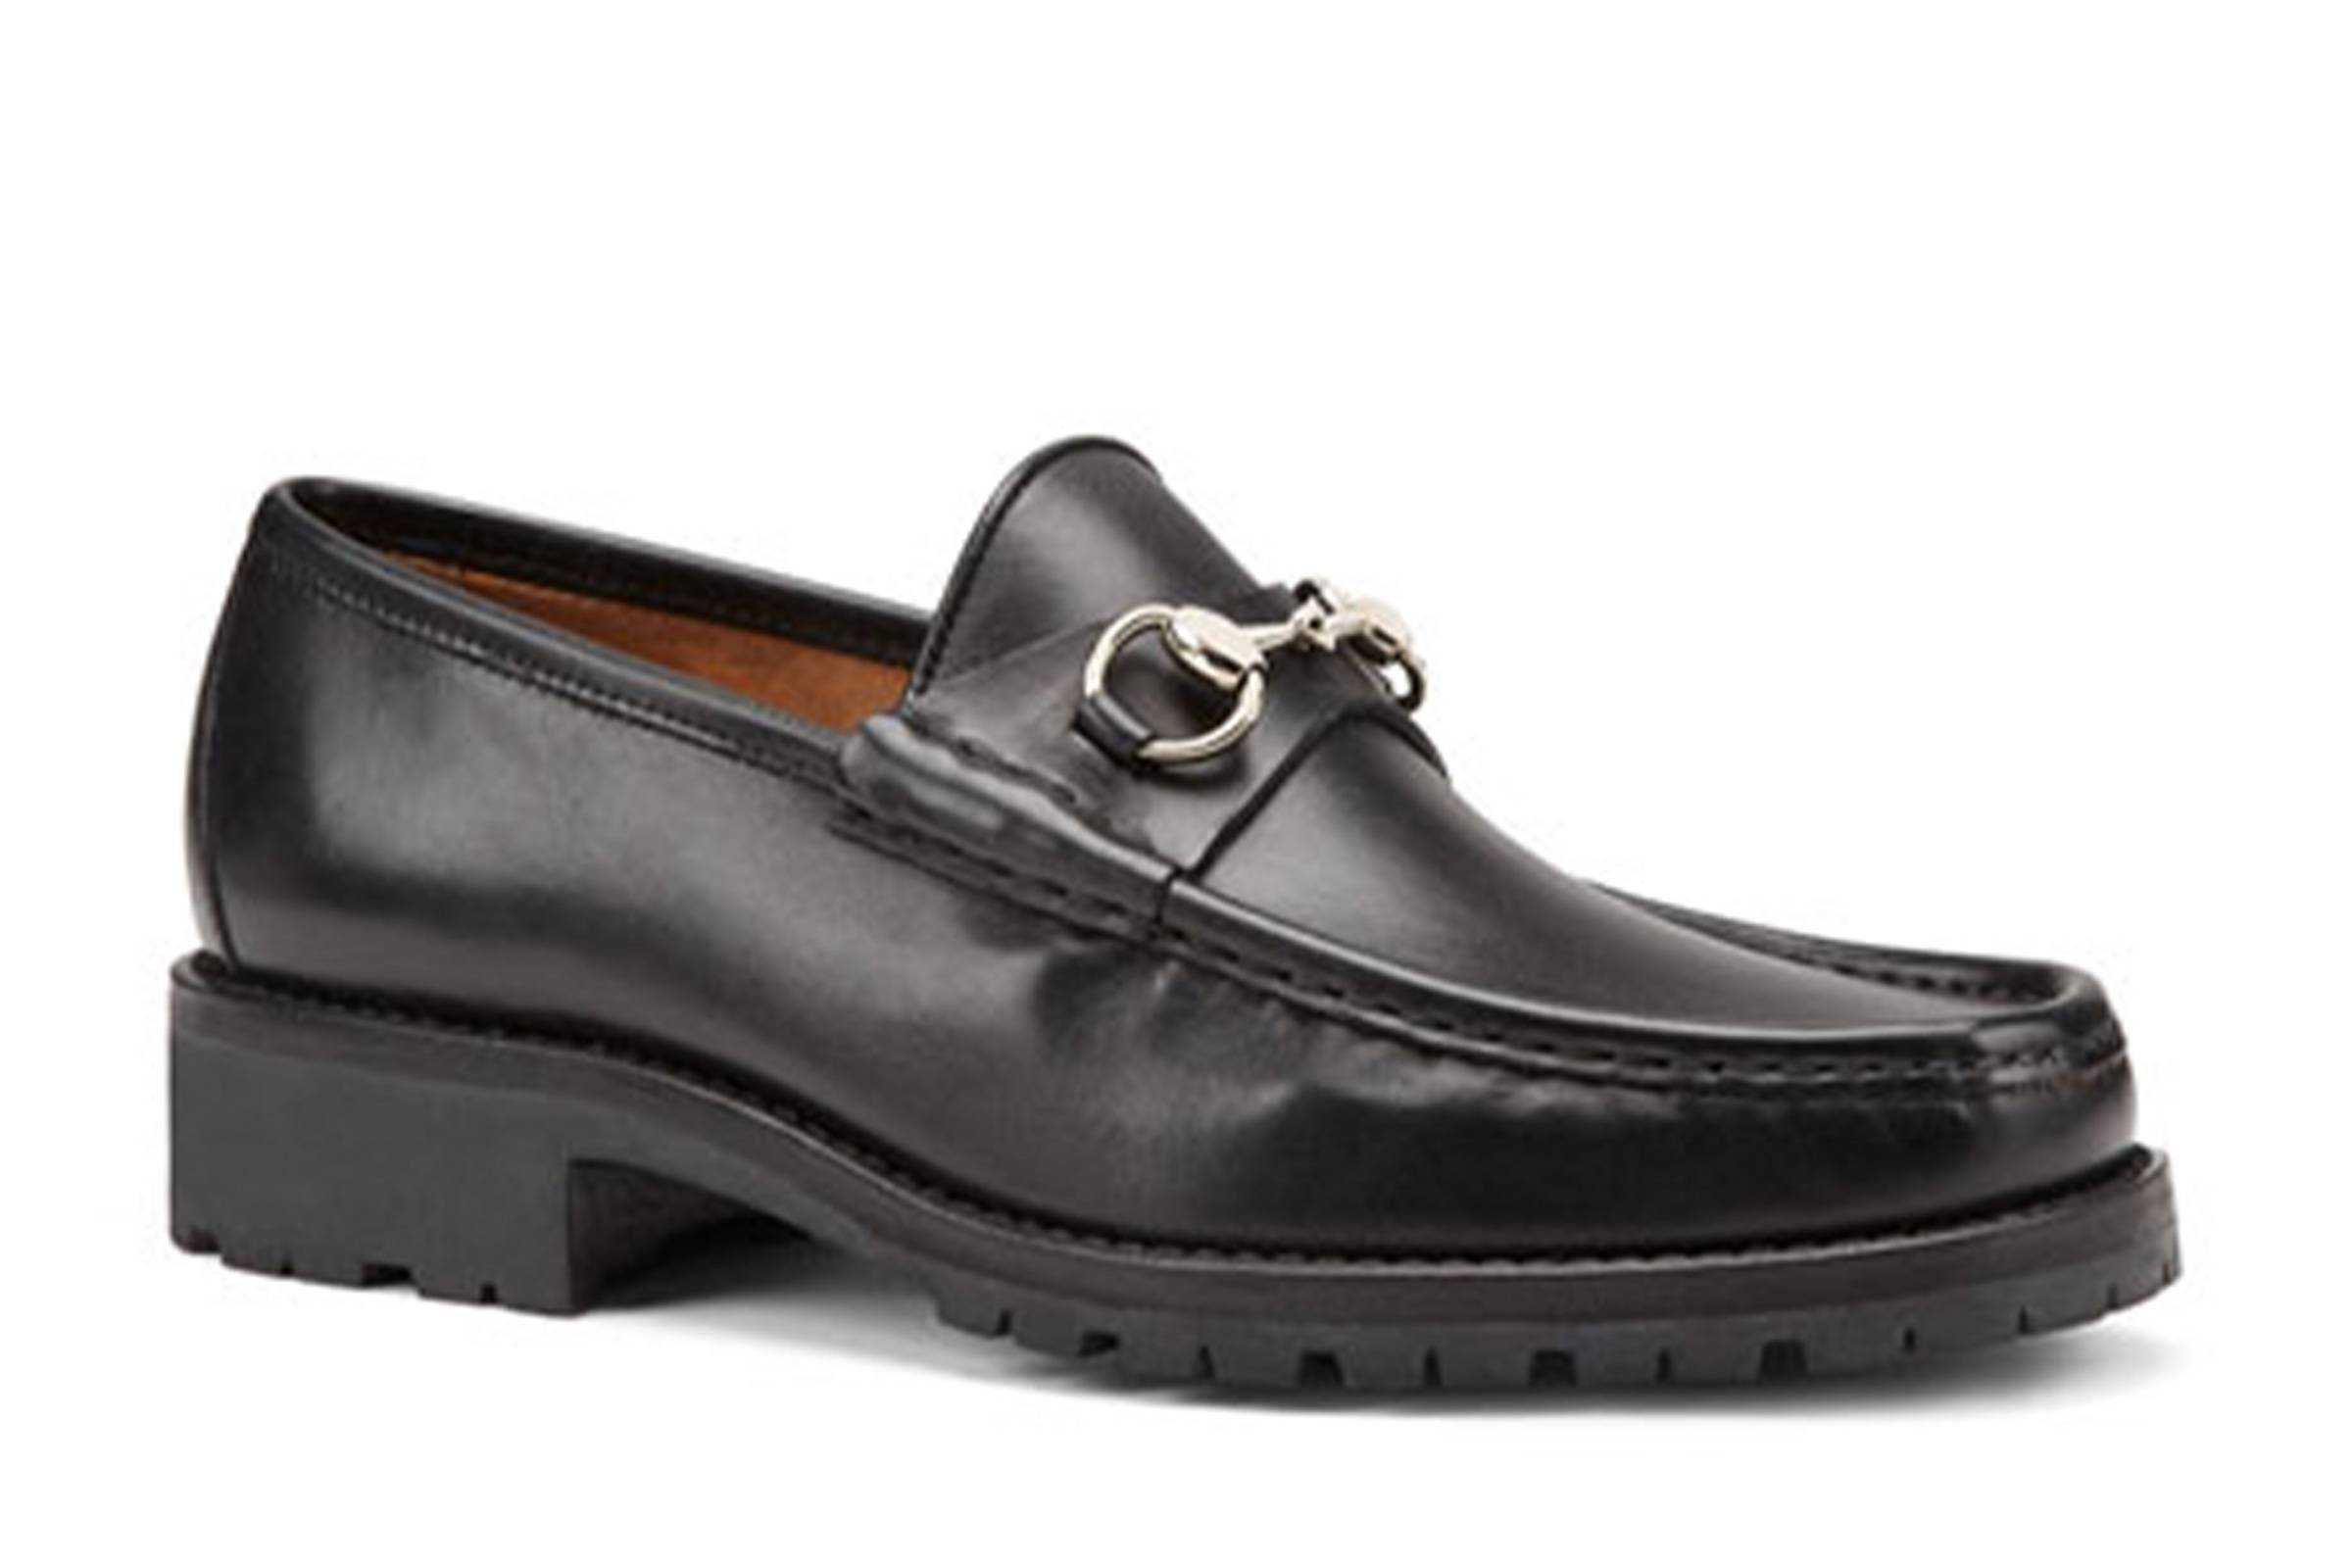 Gucci Horsebit Lug Sole Loafers